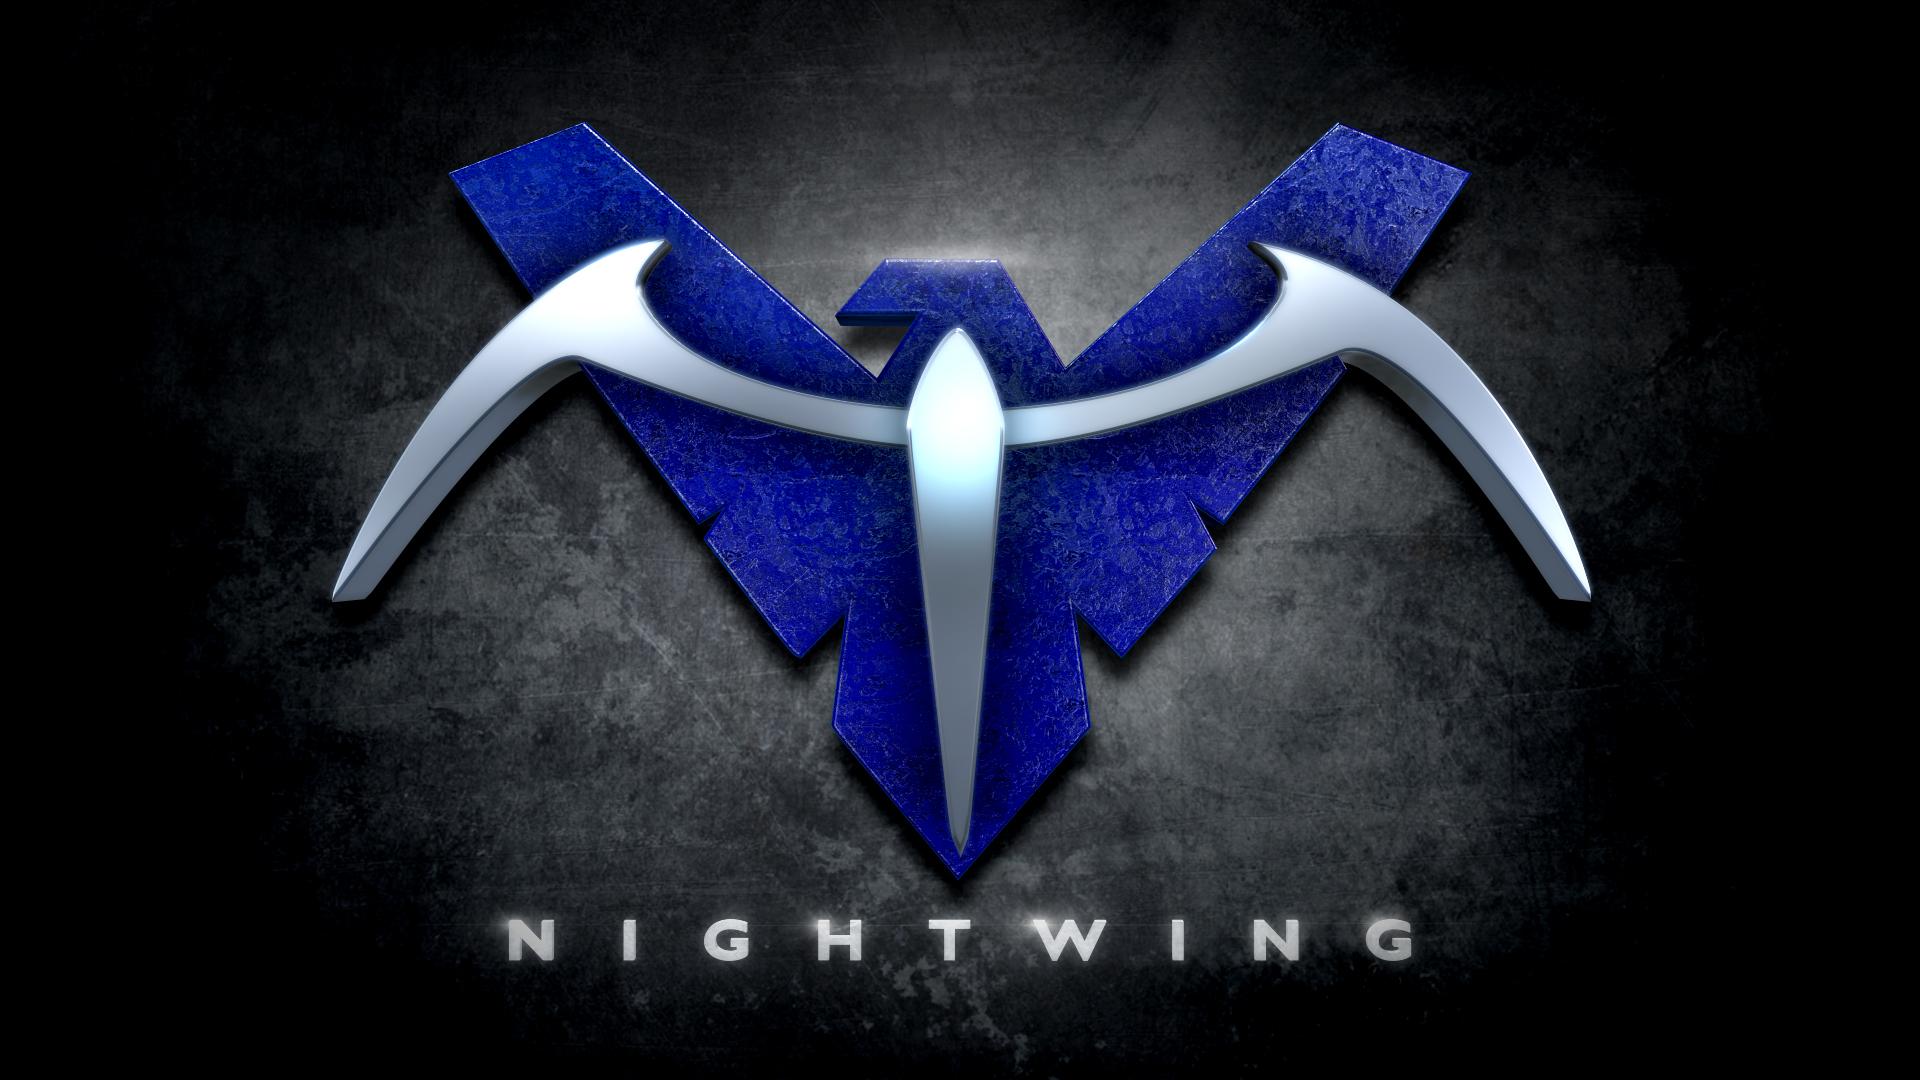 Nightwing Logo   Beloeil Jones 1920x1080